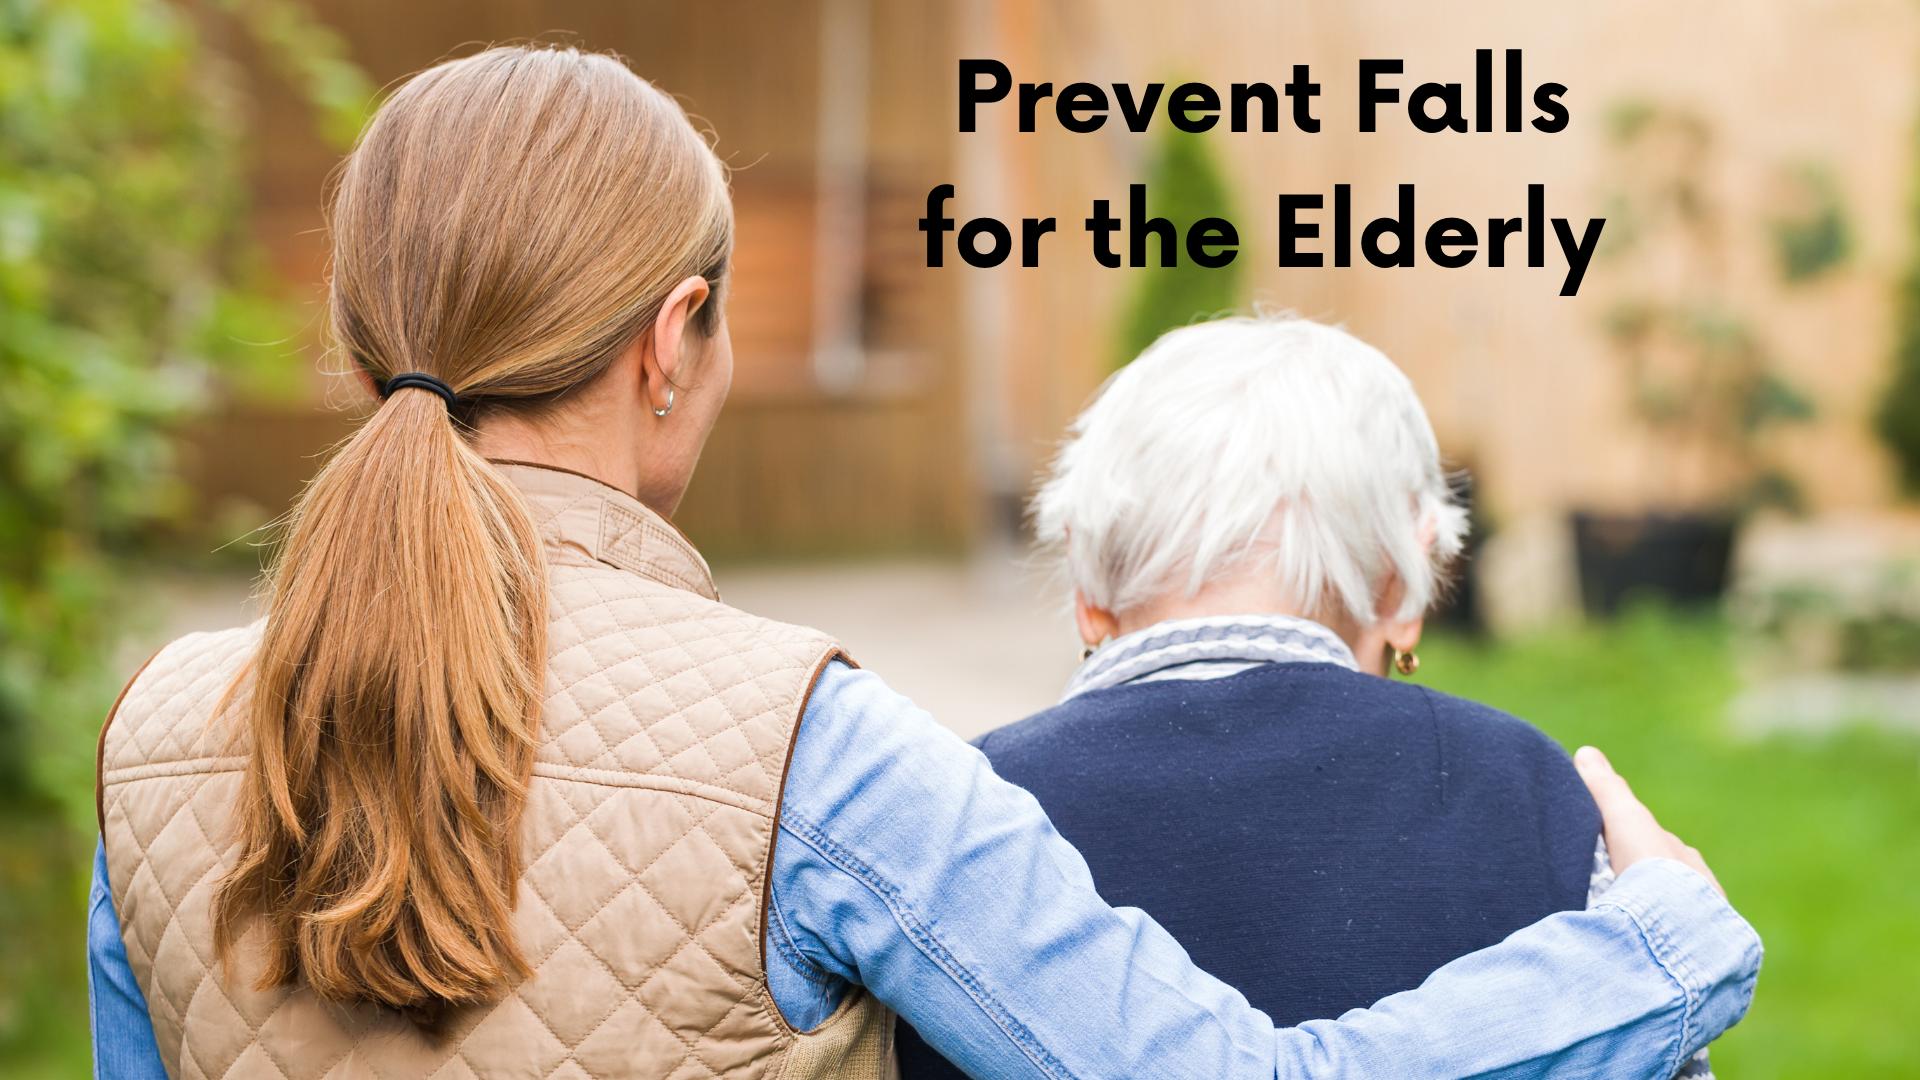 How to Prevent Falls for Elderly